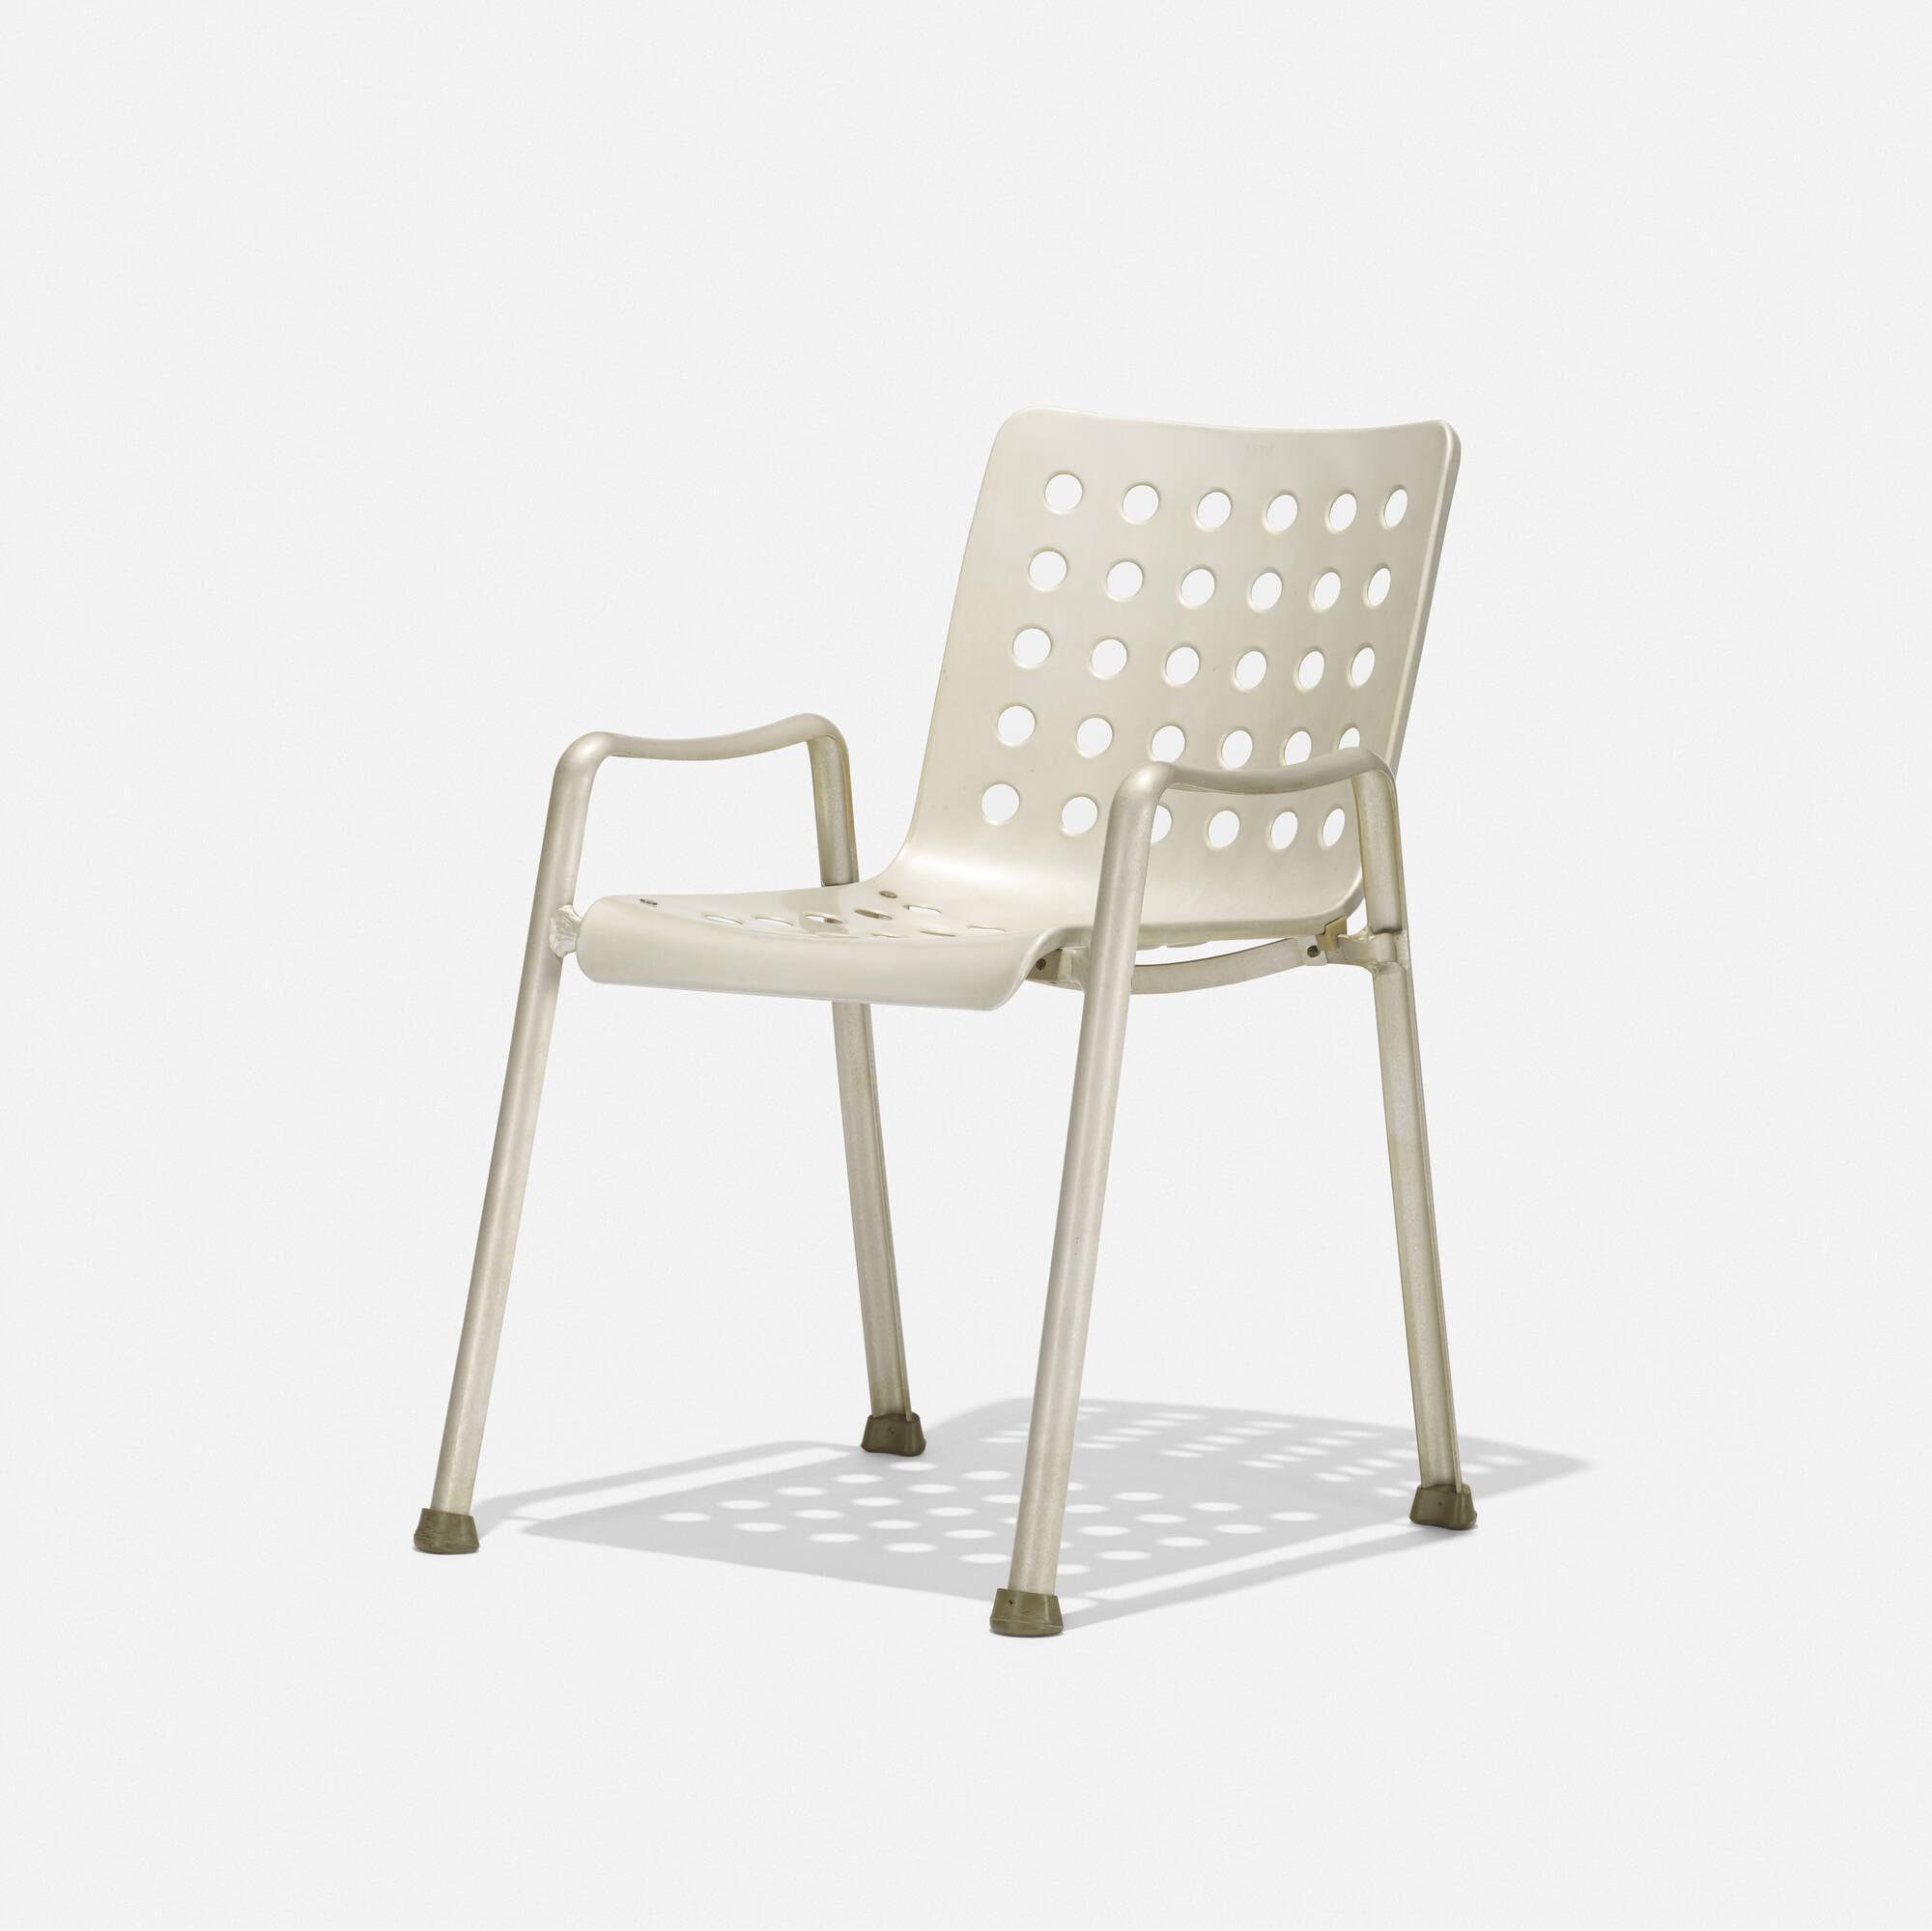 136: Hans Coray / Landi chair (1 of 3)